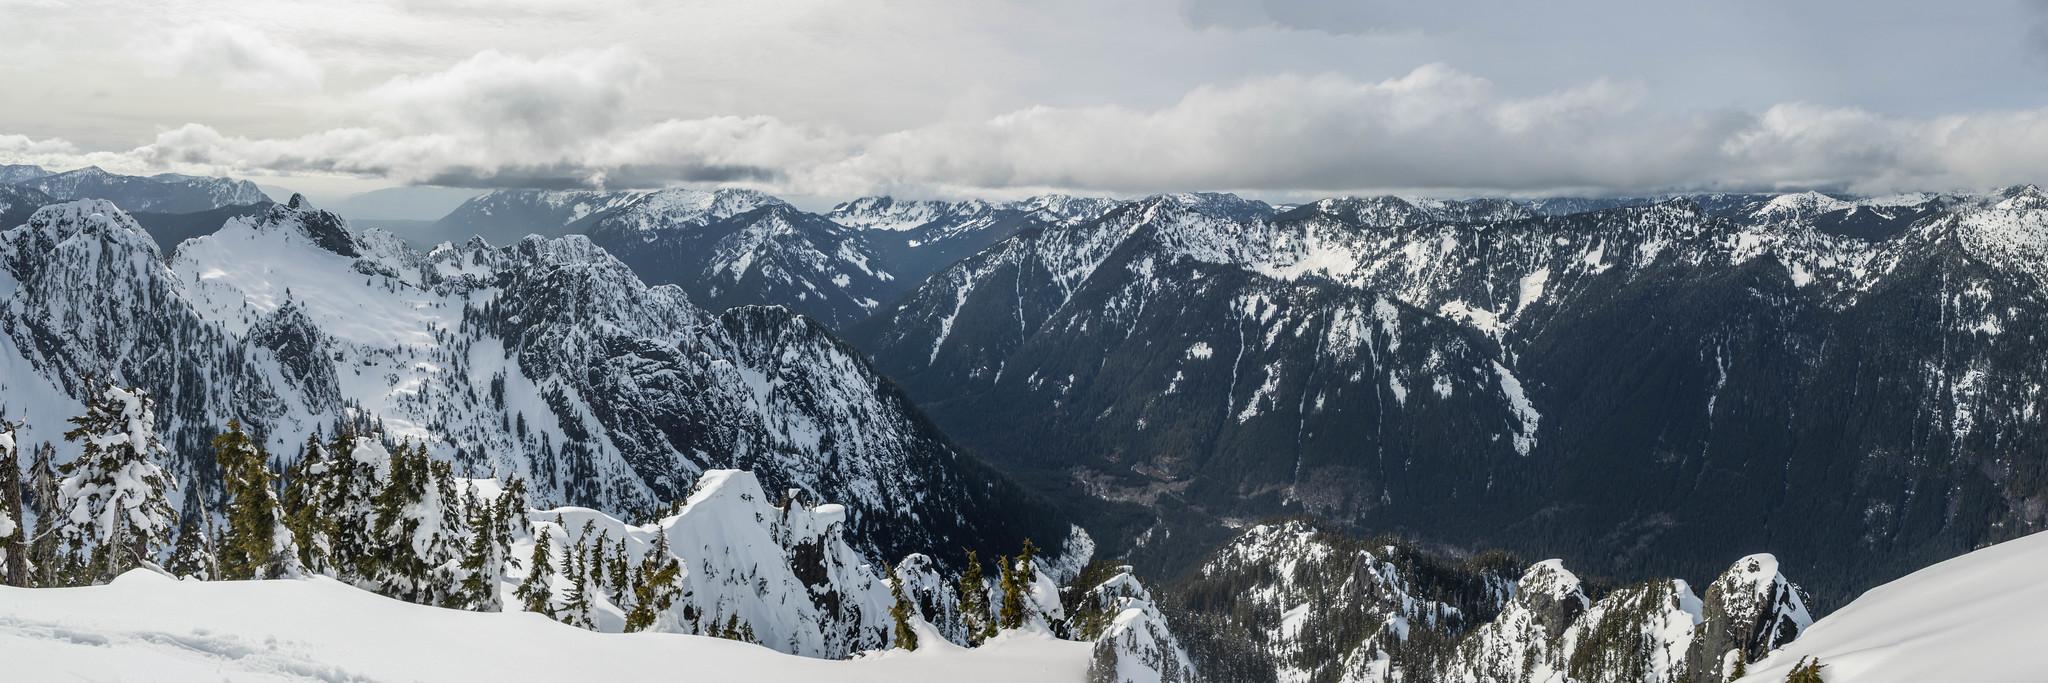 Southwestern panoramic view from Treen Peak summit